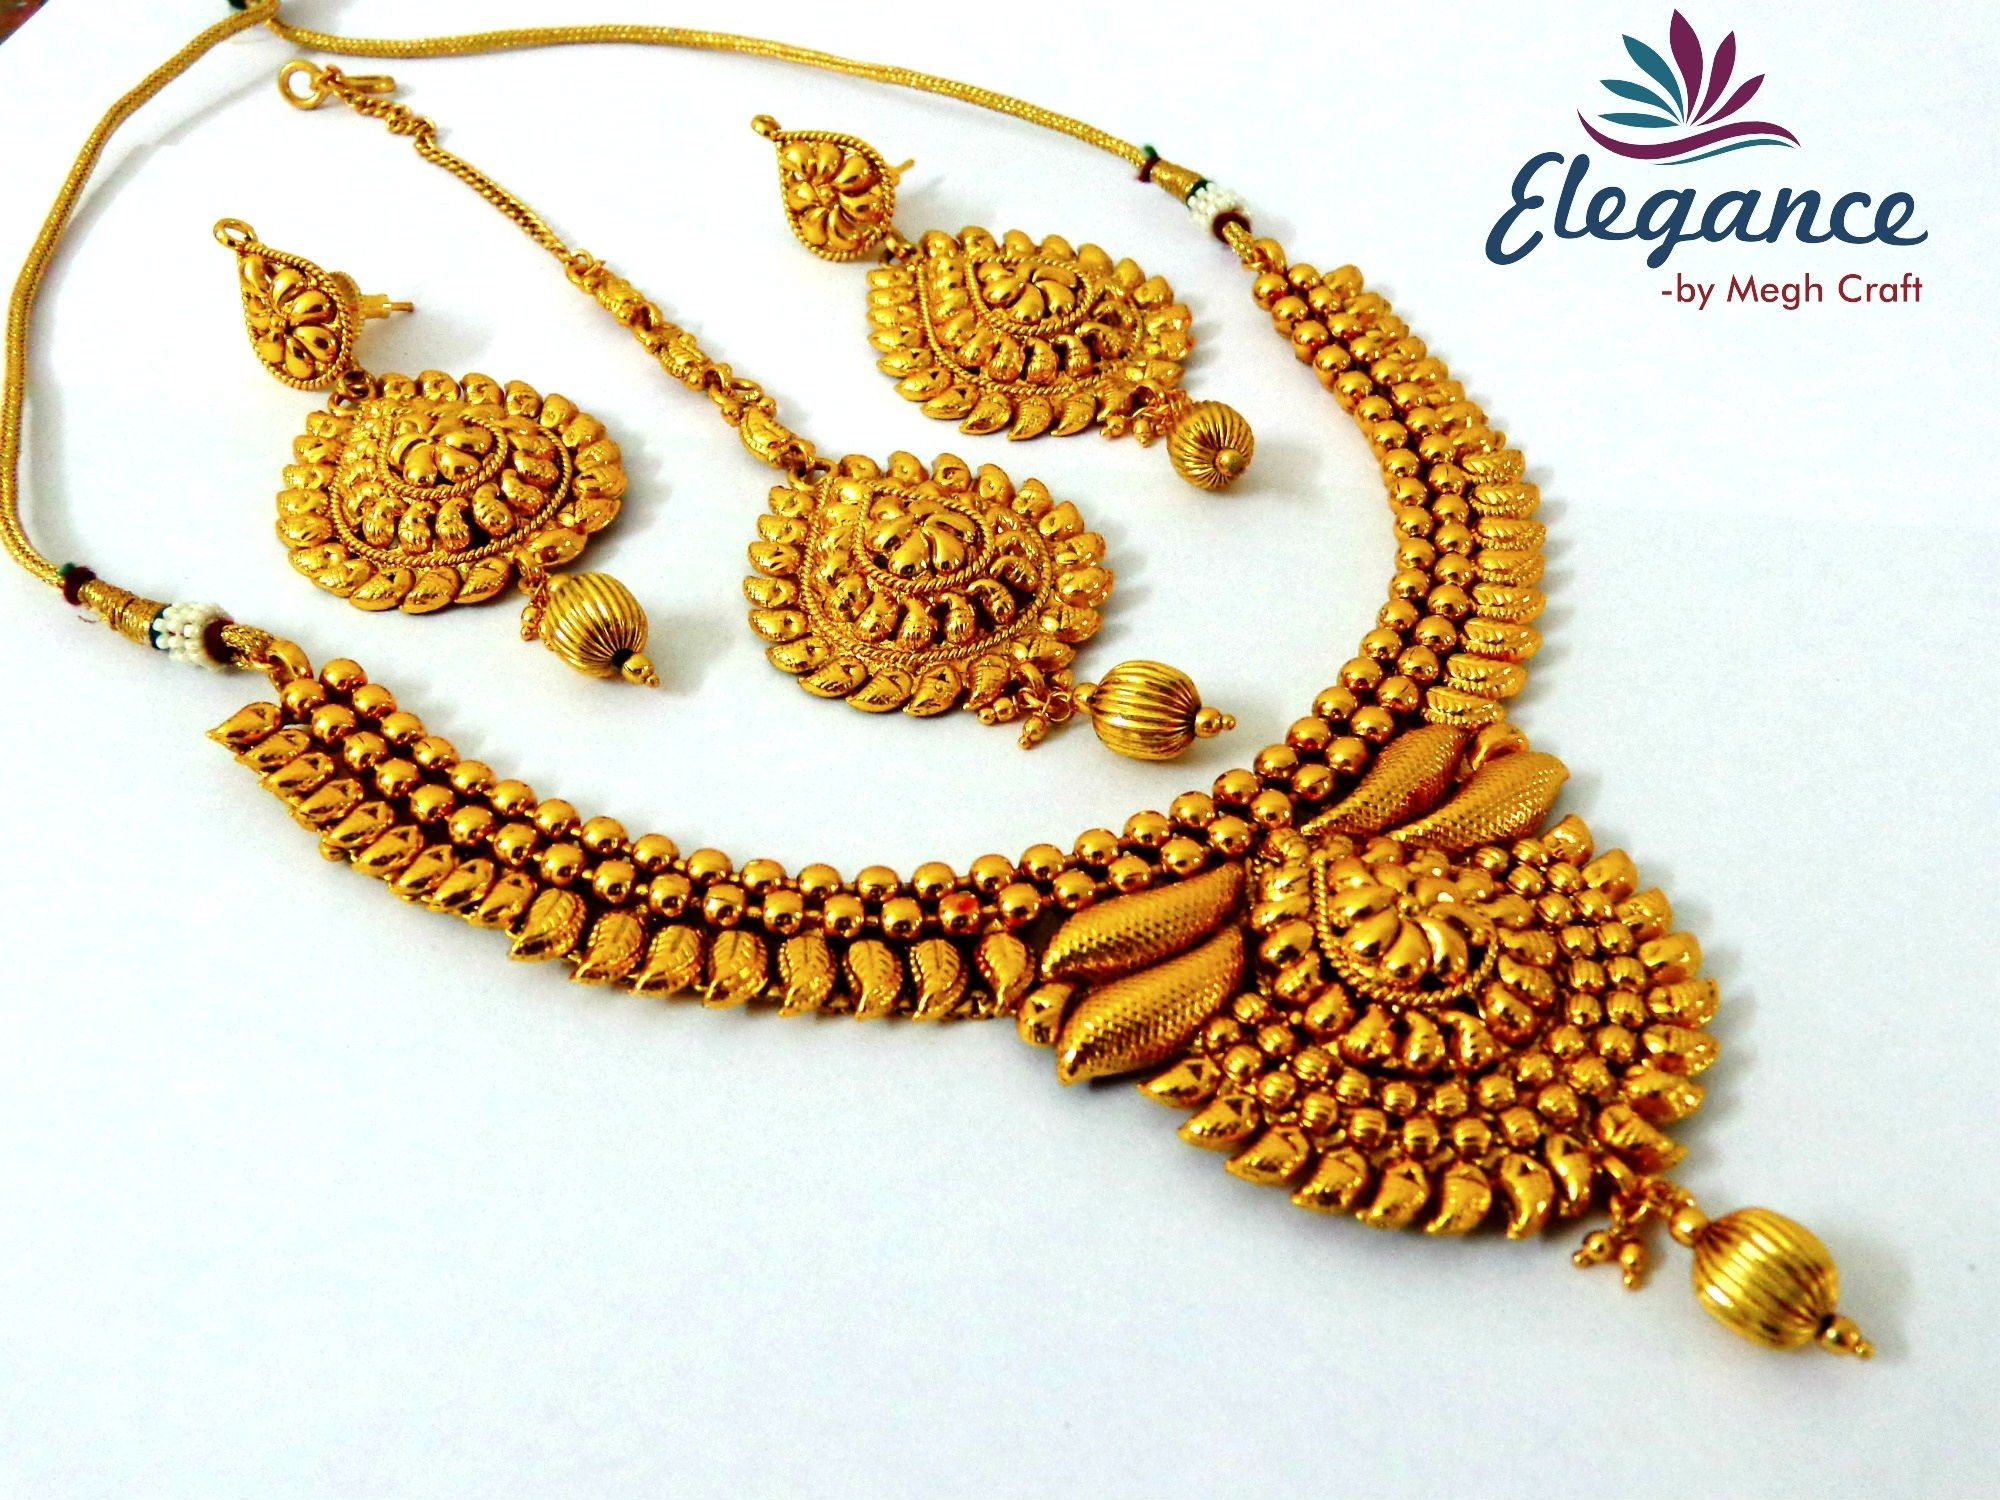 Pin by saniya fattani on Gold jewel | Pinterest | Jewel and Gold